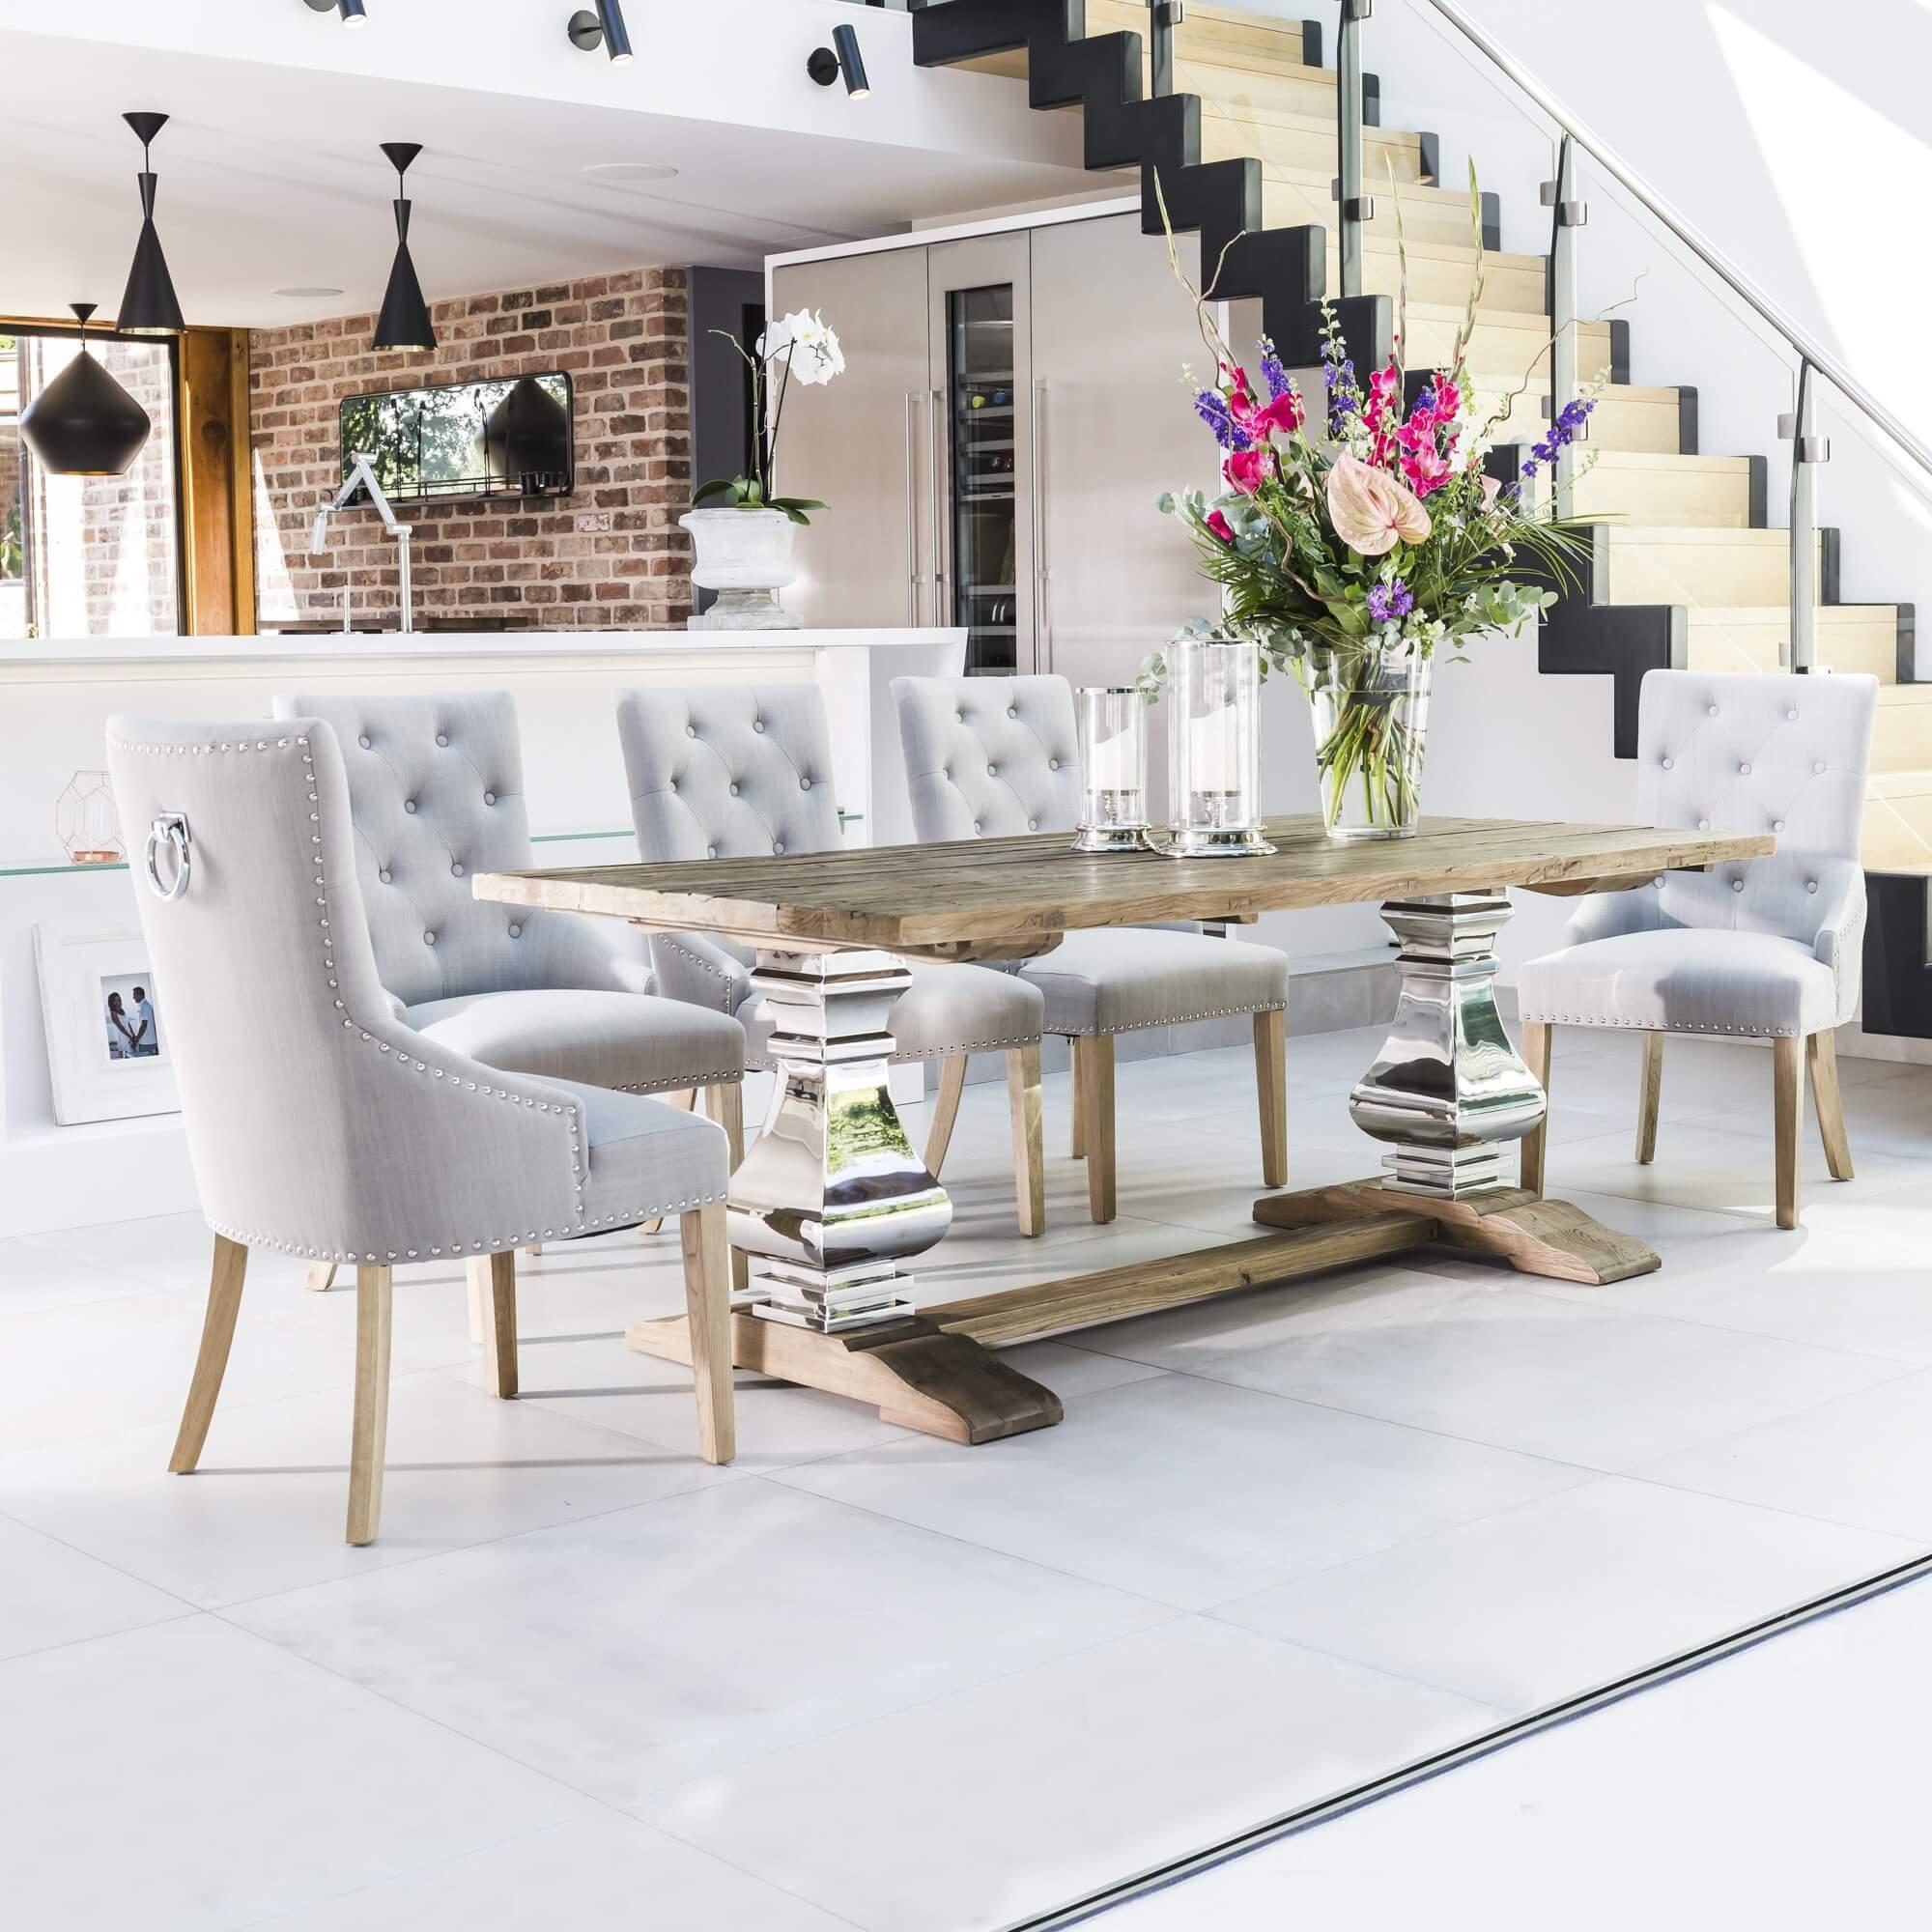 Top 10 Interior Design Blogs – Stay in Trend